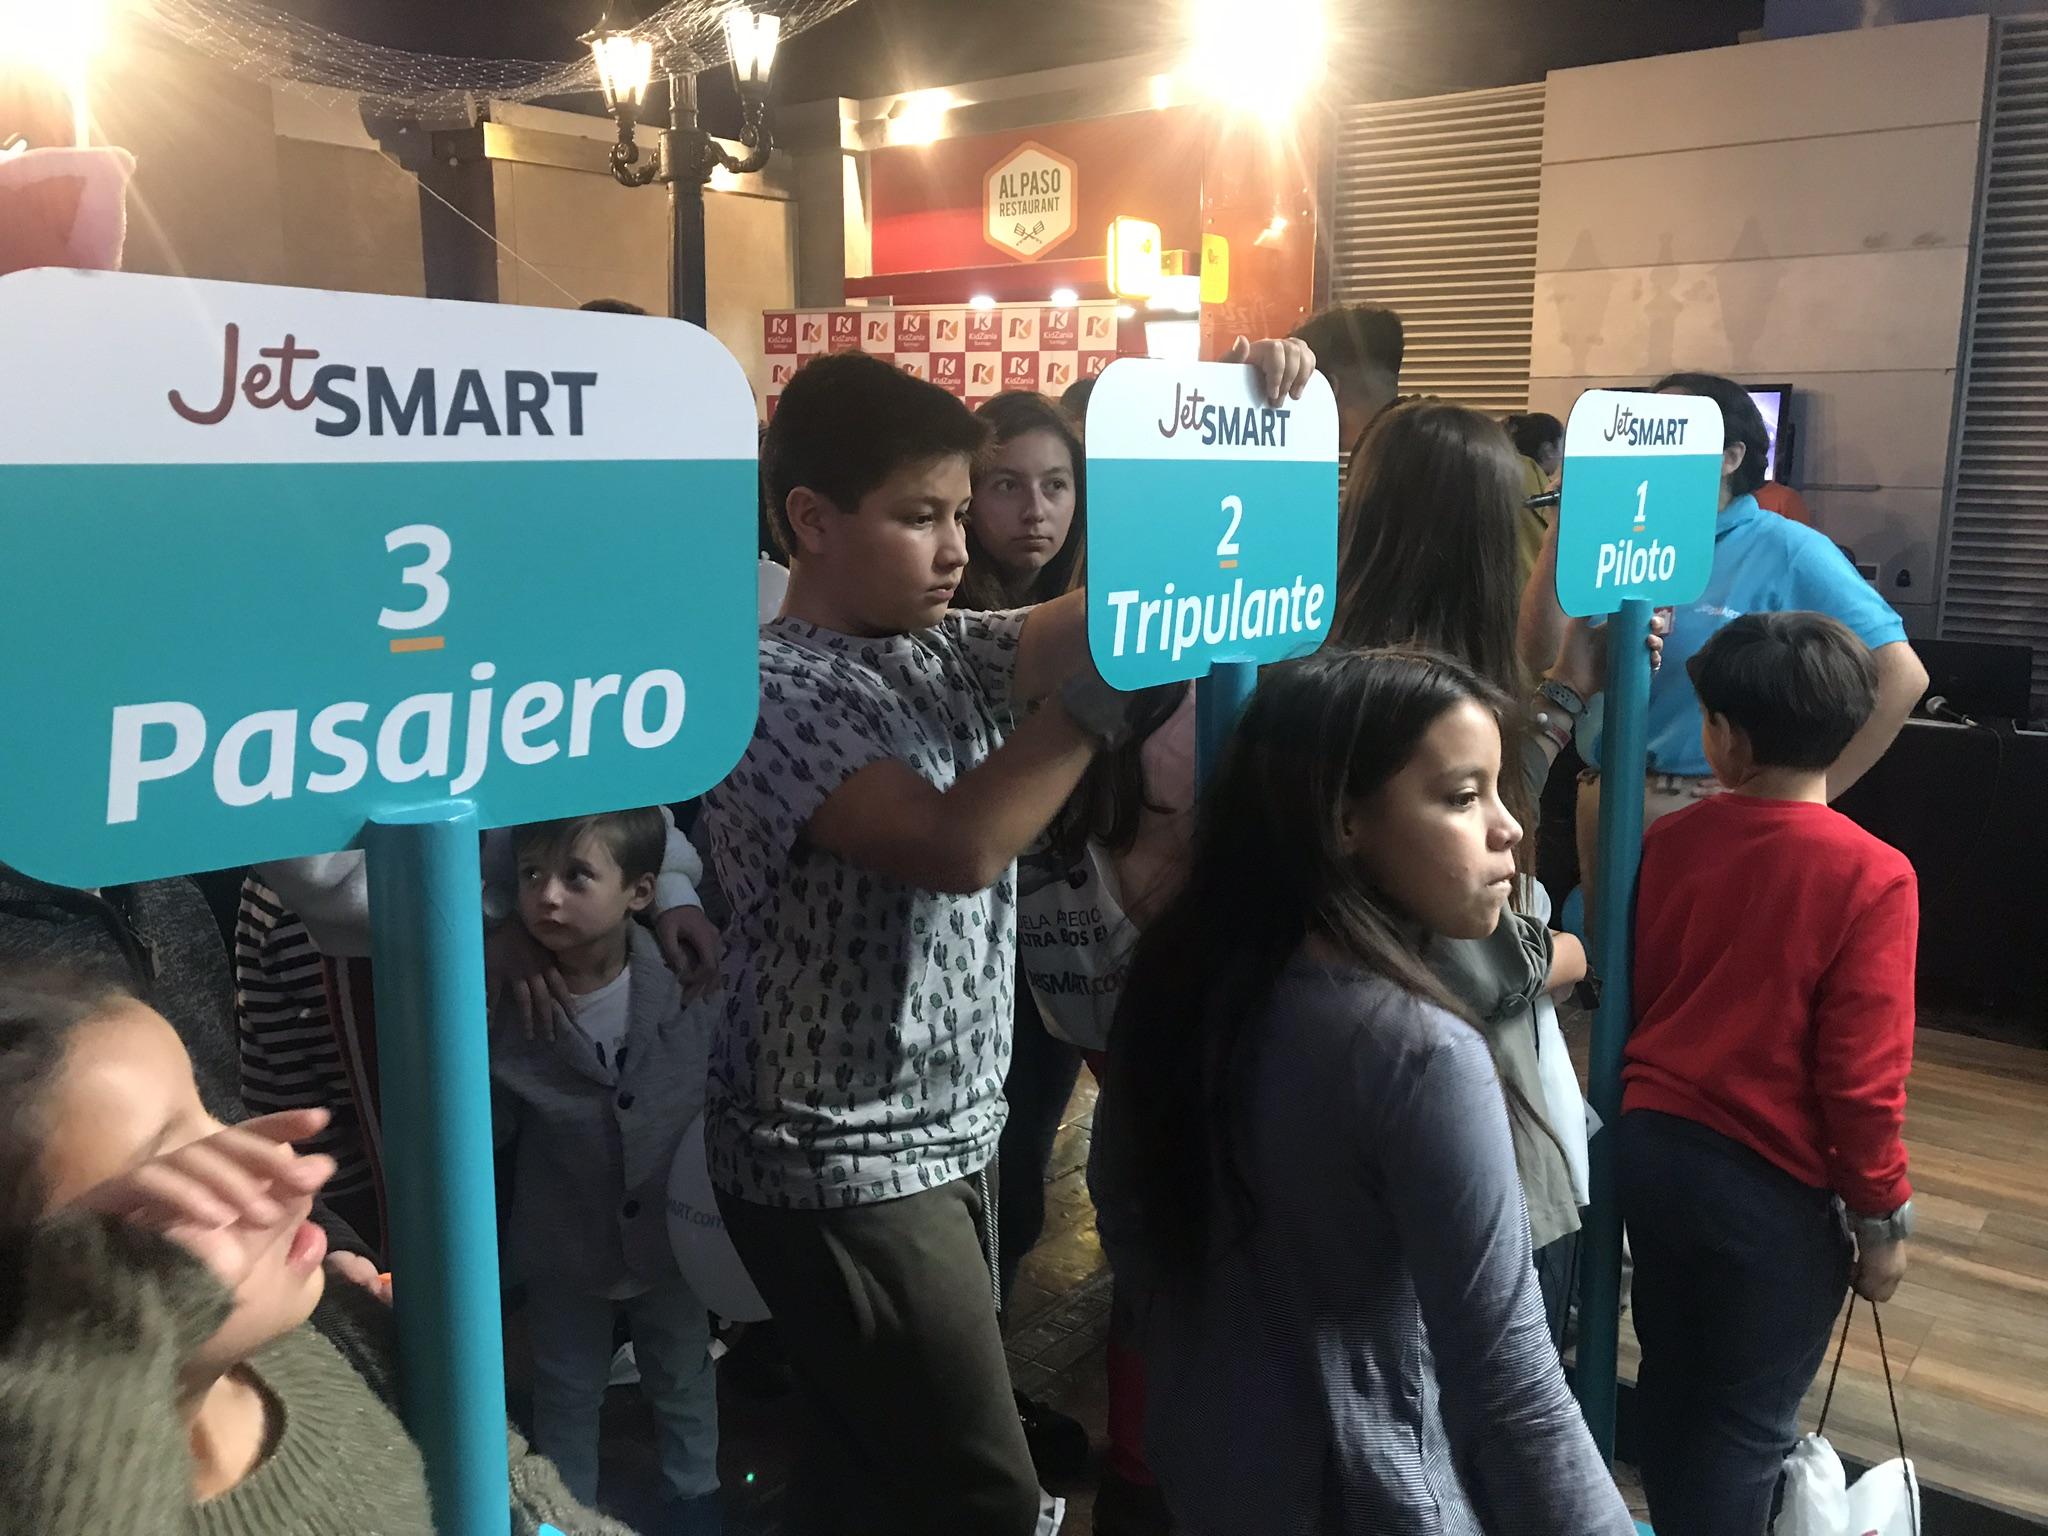 JetSmart llegó a KidZania | Mi Blog de Aventuras | 2019